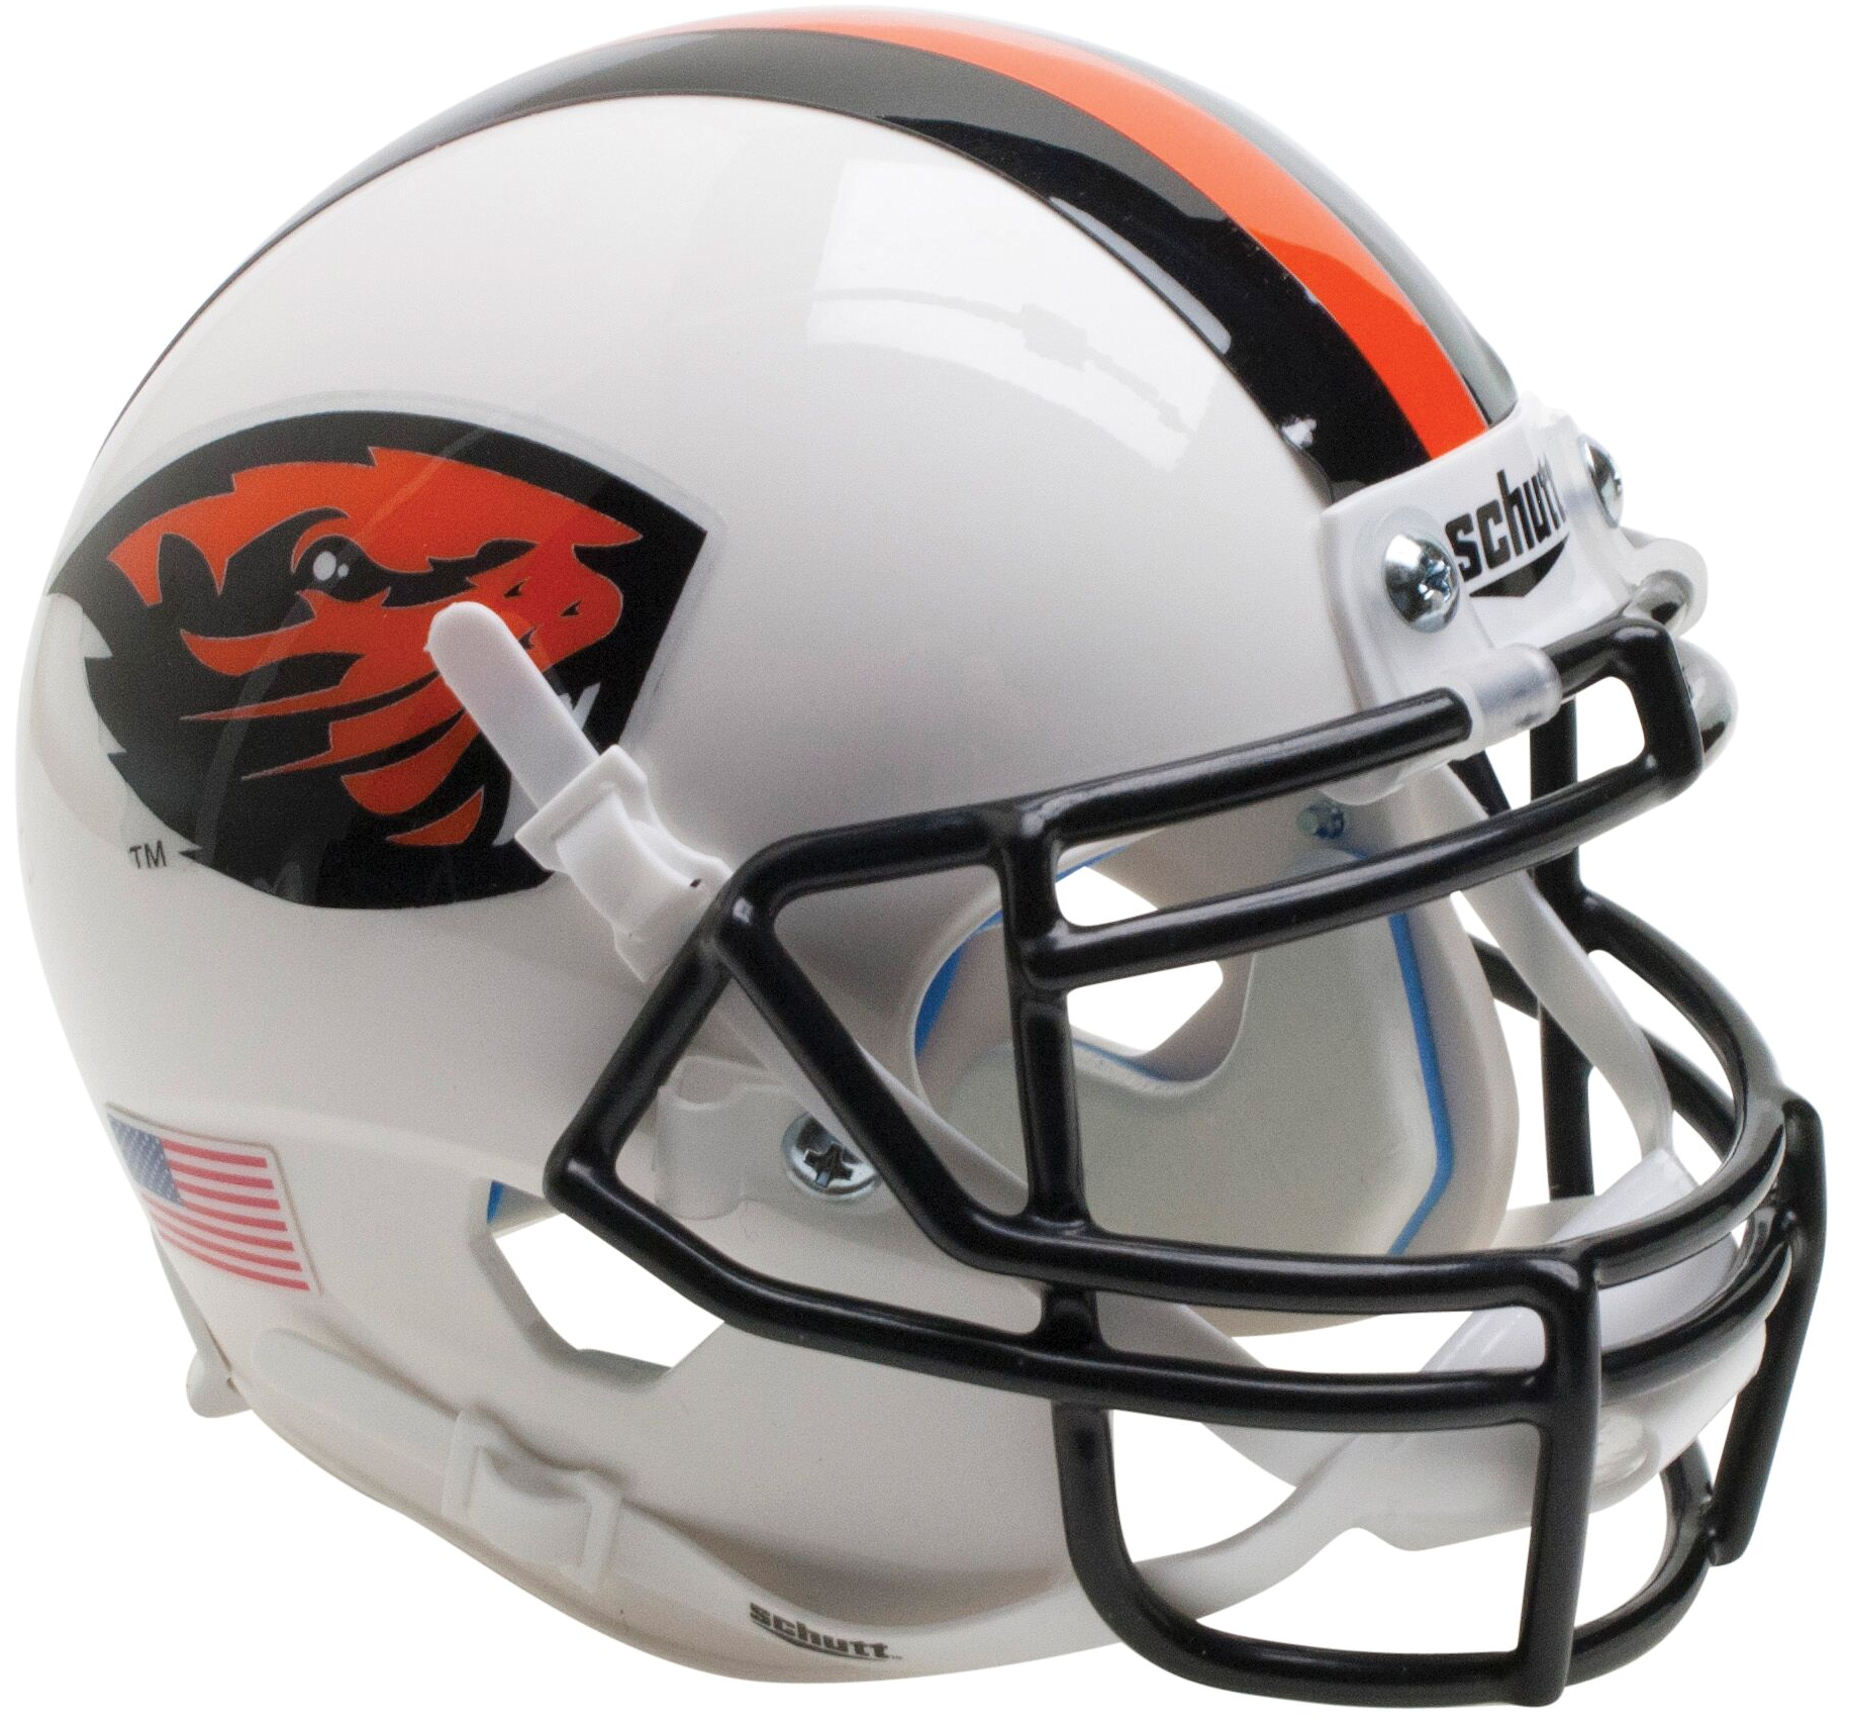 Oregon State Beavers Mini XP Authentic Helmet Schutt <B>Orange Beaver/Stripe</B>